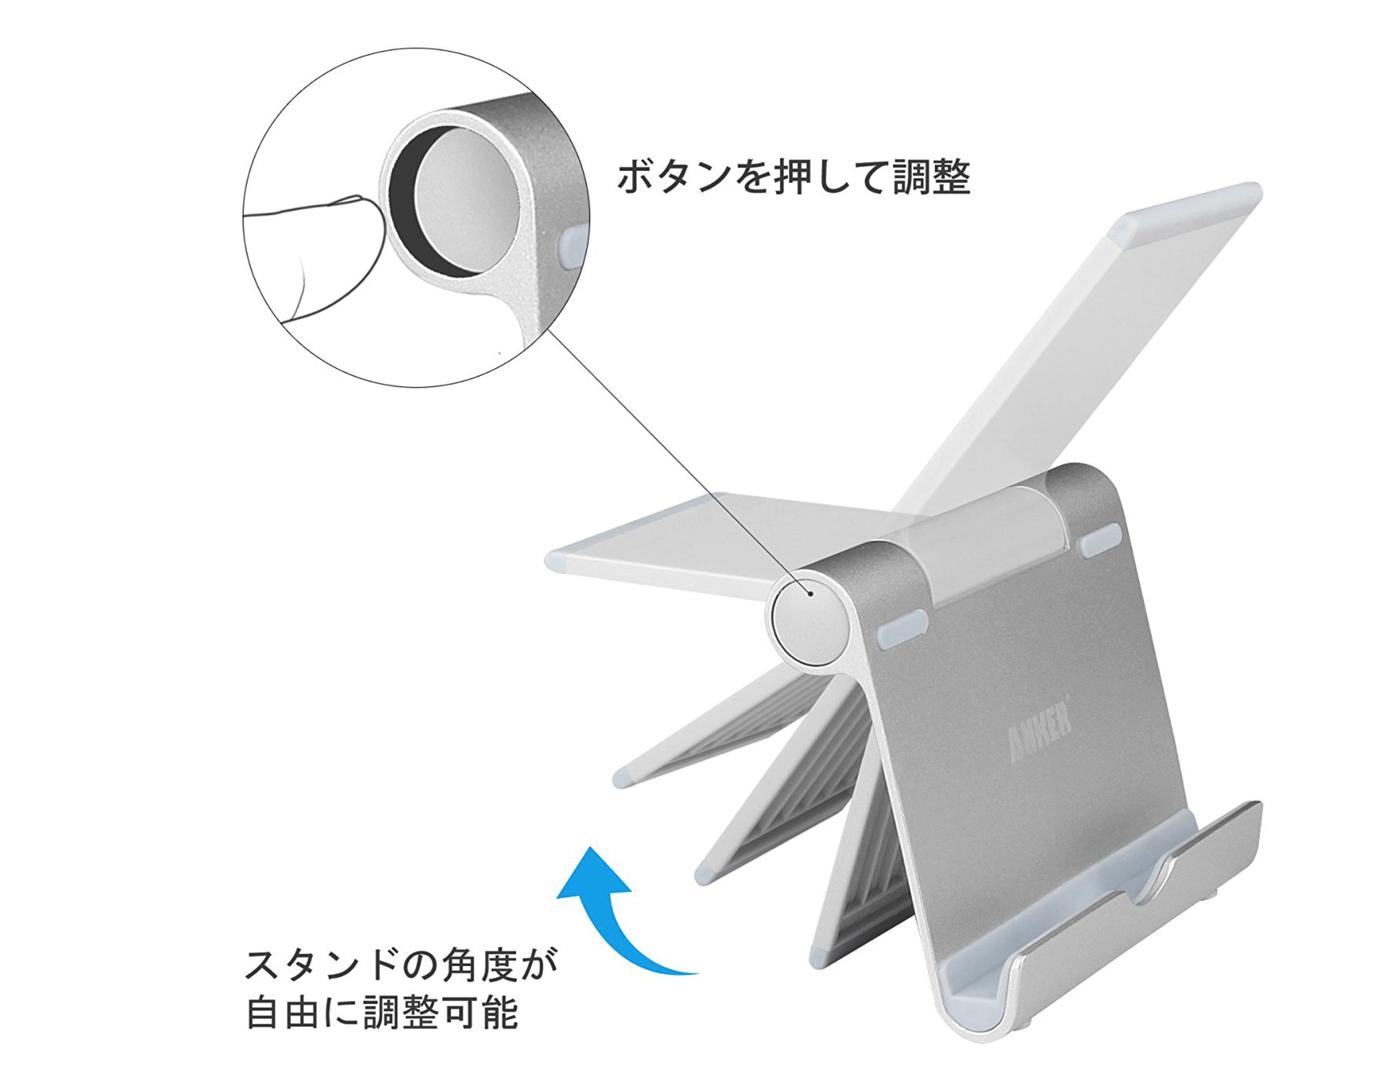 Anker タブレット用スタンド 角度調整可能 iPad・iPad mini・Nexus 7等 (シルバー2